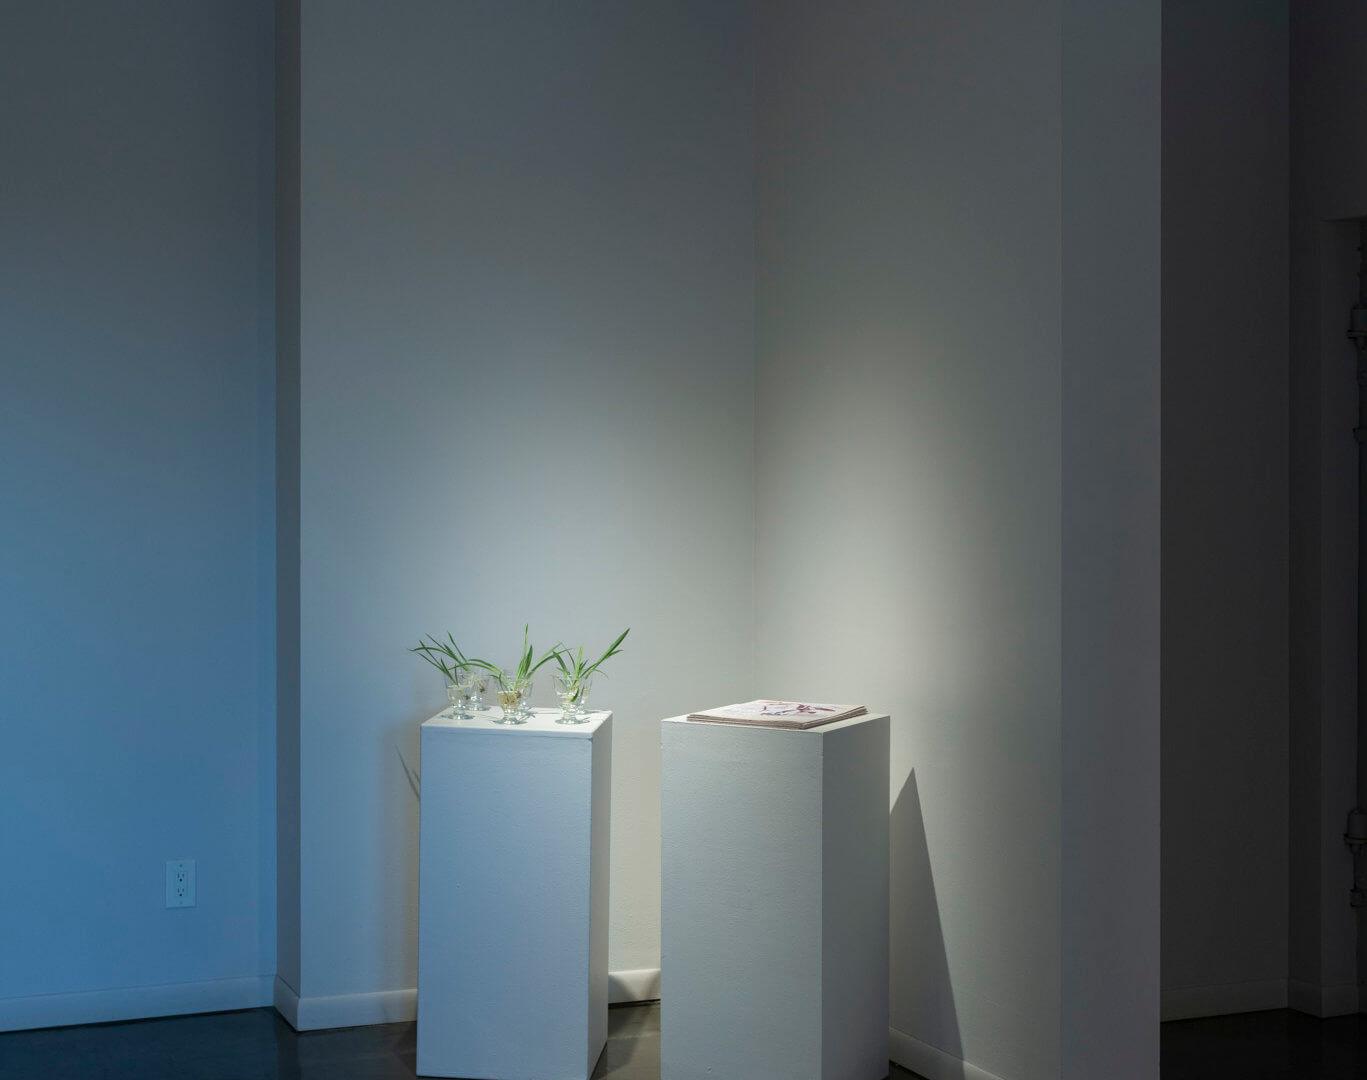 Installation view of Futures Barren / Futures Abundant. Image credit: Sarah Fuller.